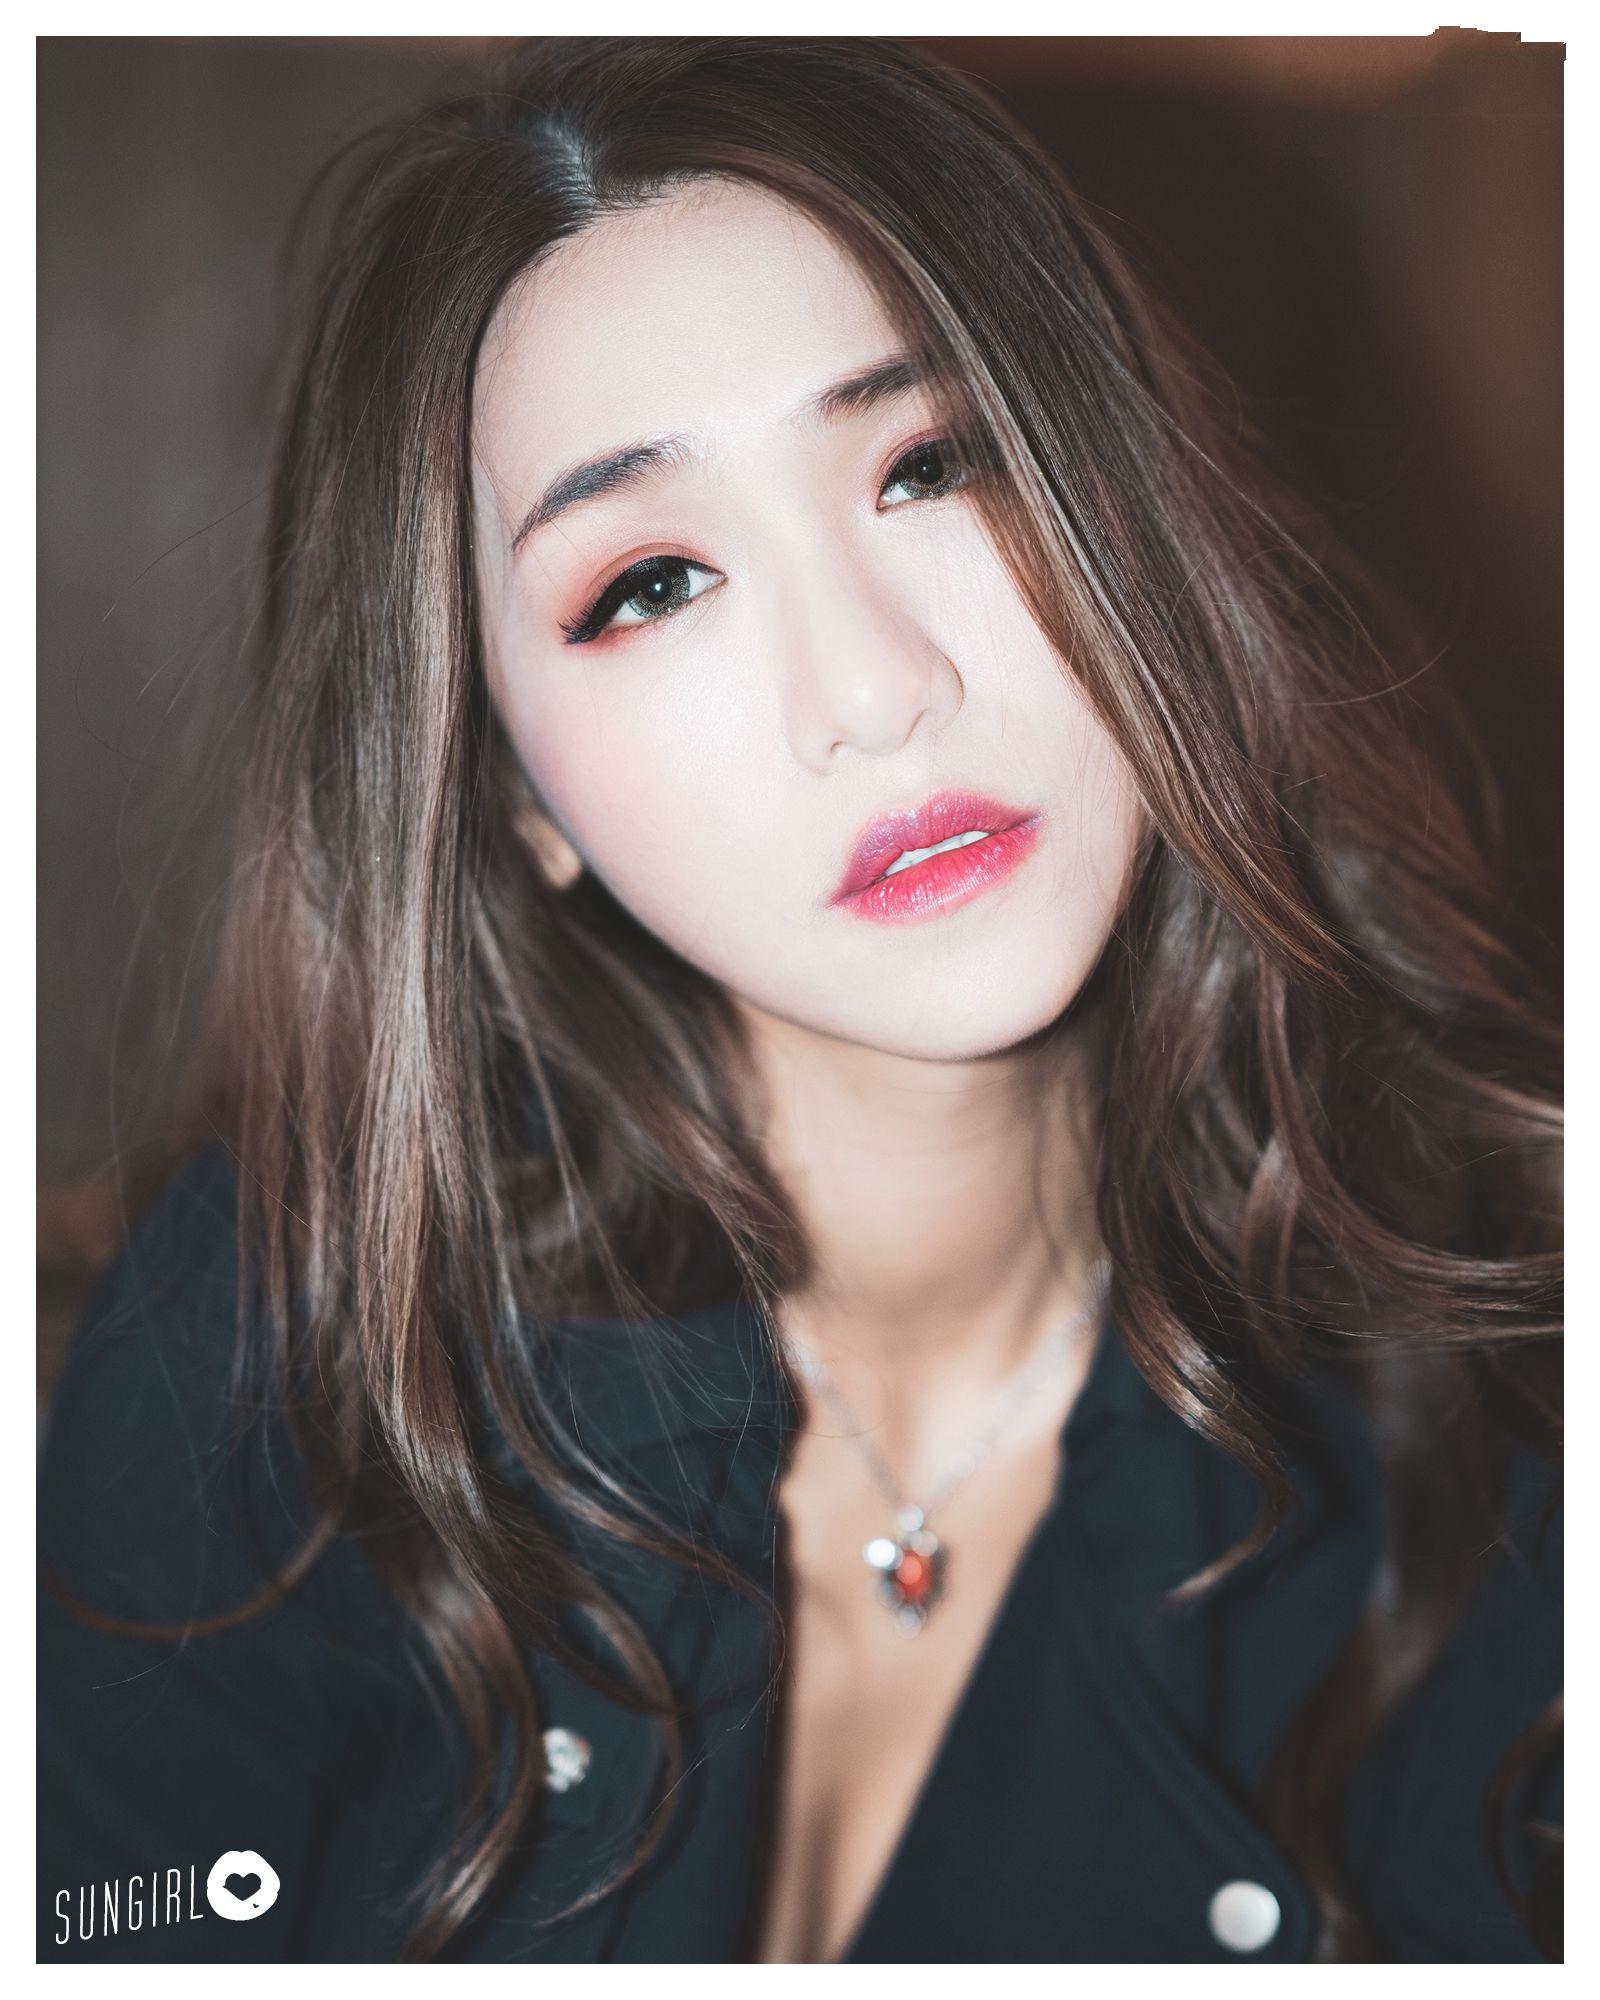 VOL.1018 [阳光宝贝]惊艳魅惑美女:Cami超高清个人性感漂亮大图(32P)